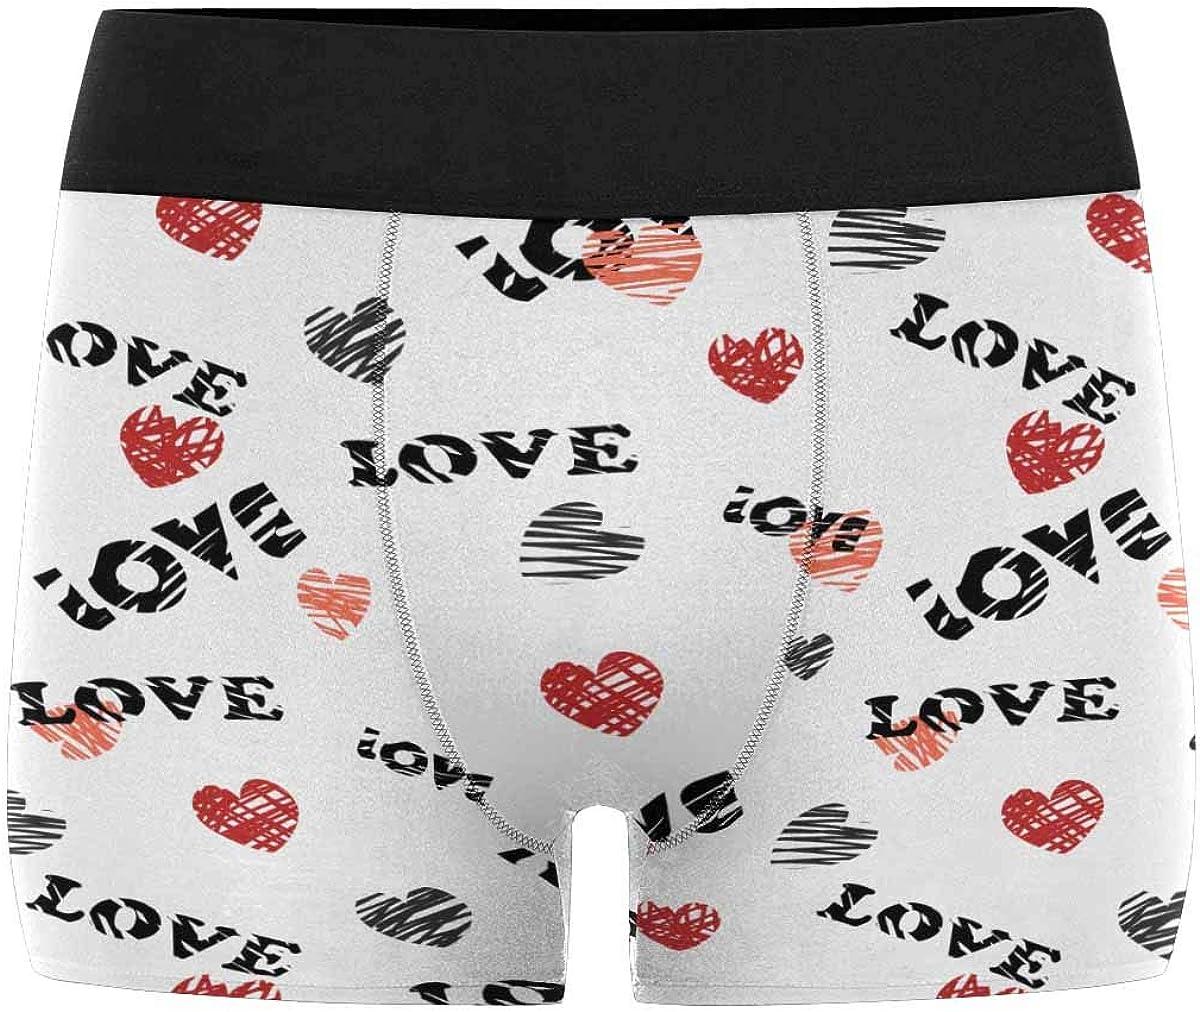 M Merry Christmas Snowman and Snowflakes XS-3XL INTERESTPRINT Boxer Briefs Mens Underwear